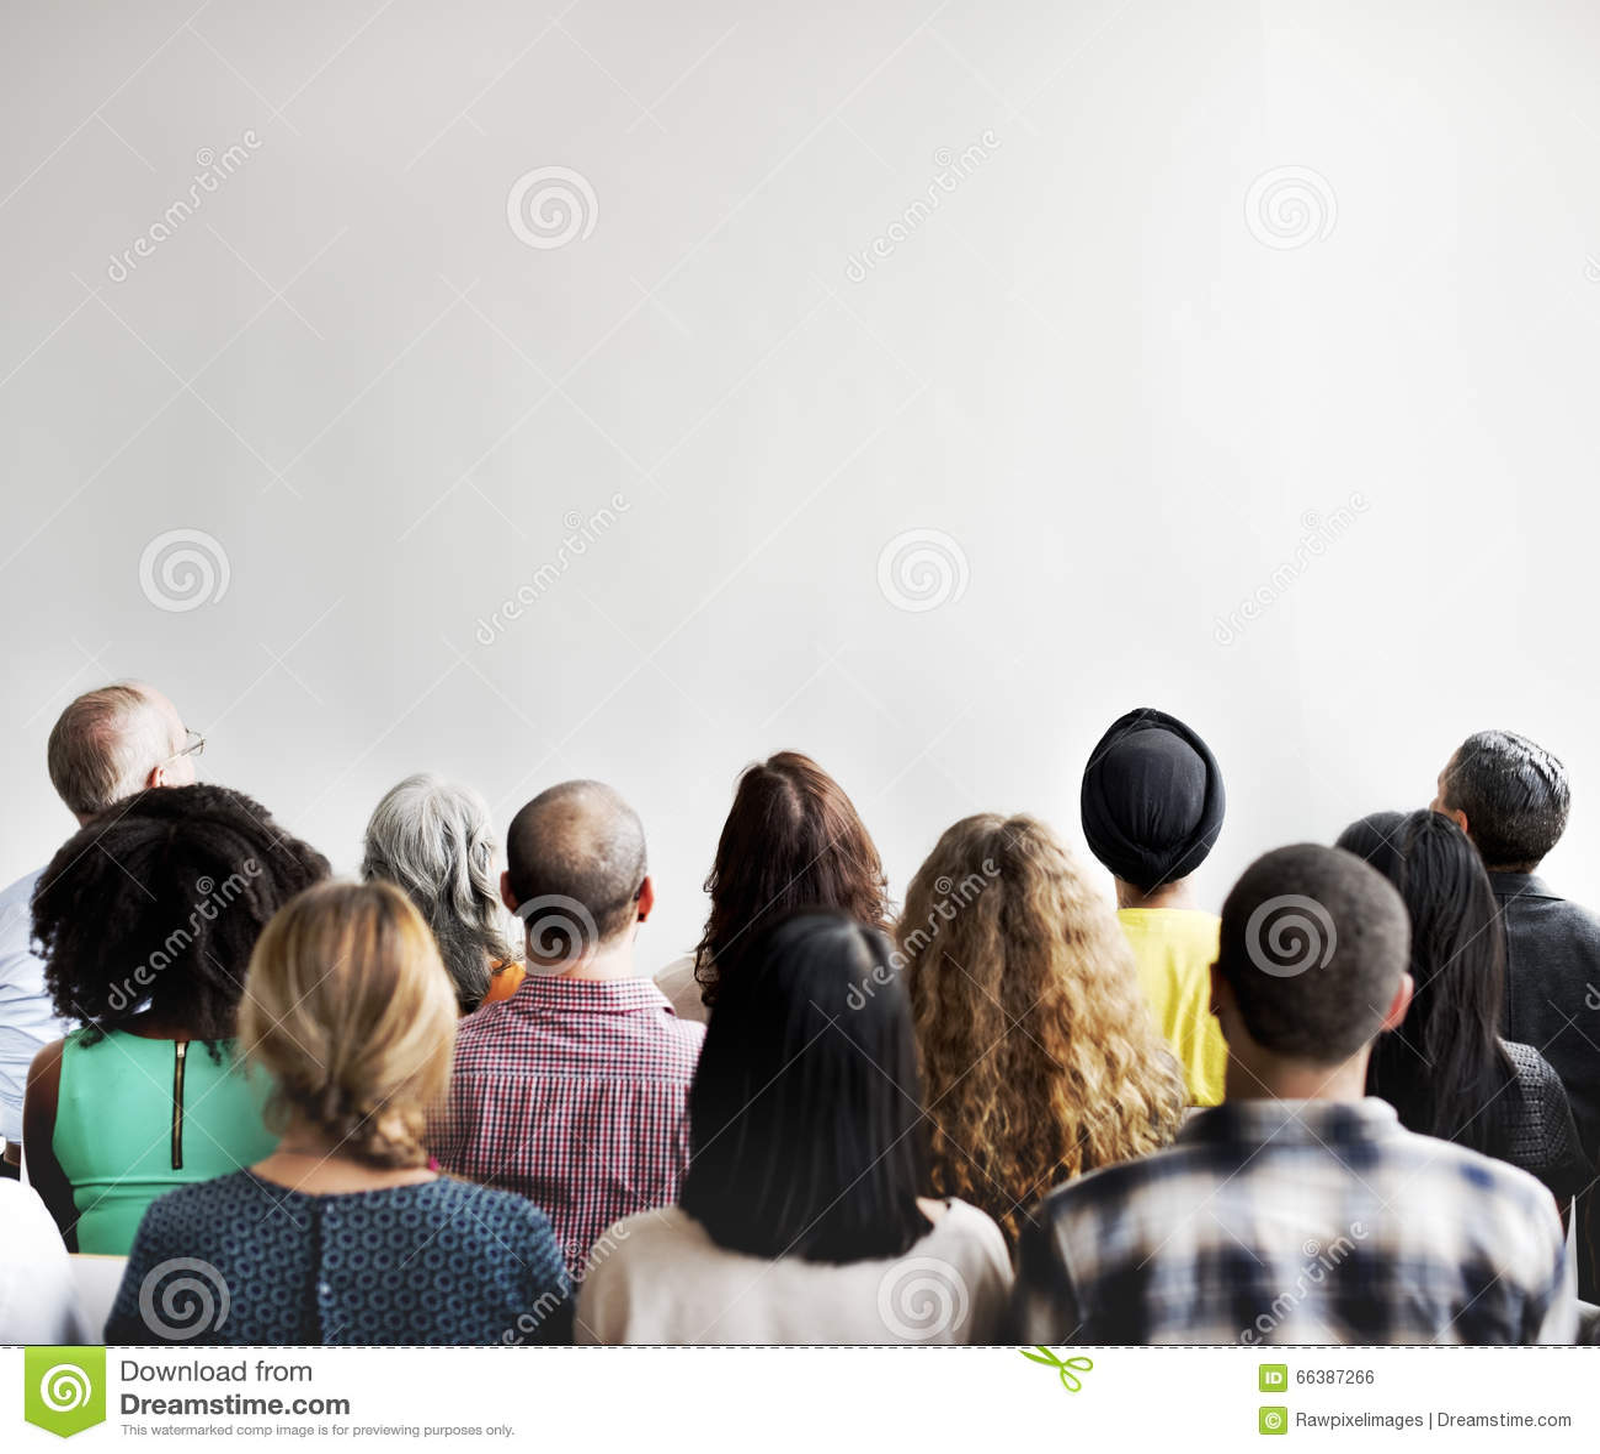 Geschäft Team Seminar Conference Audience Concept